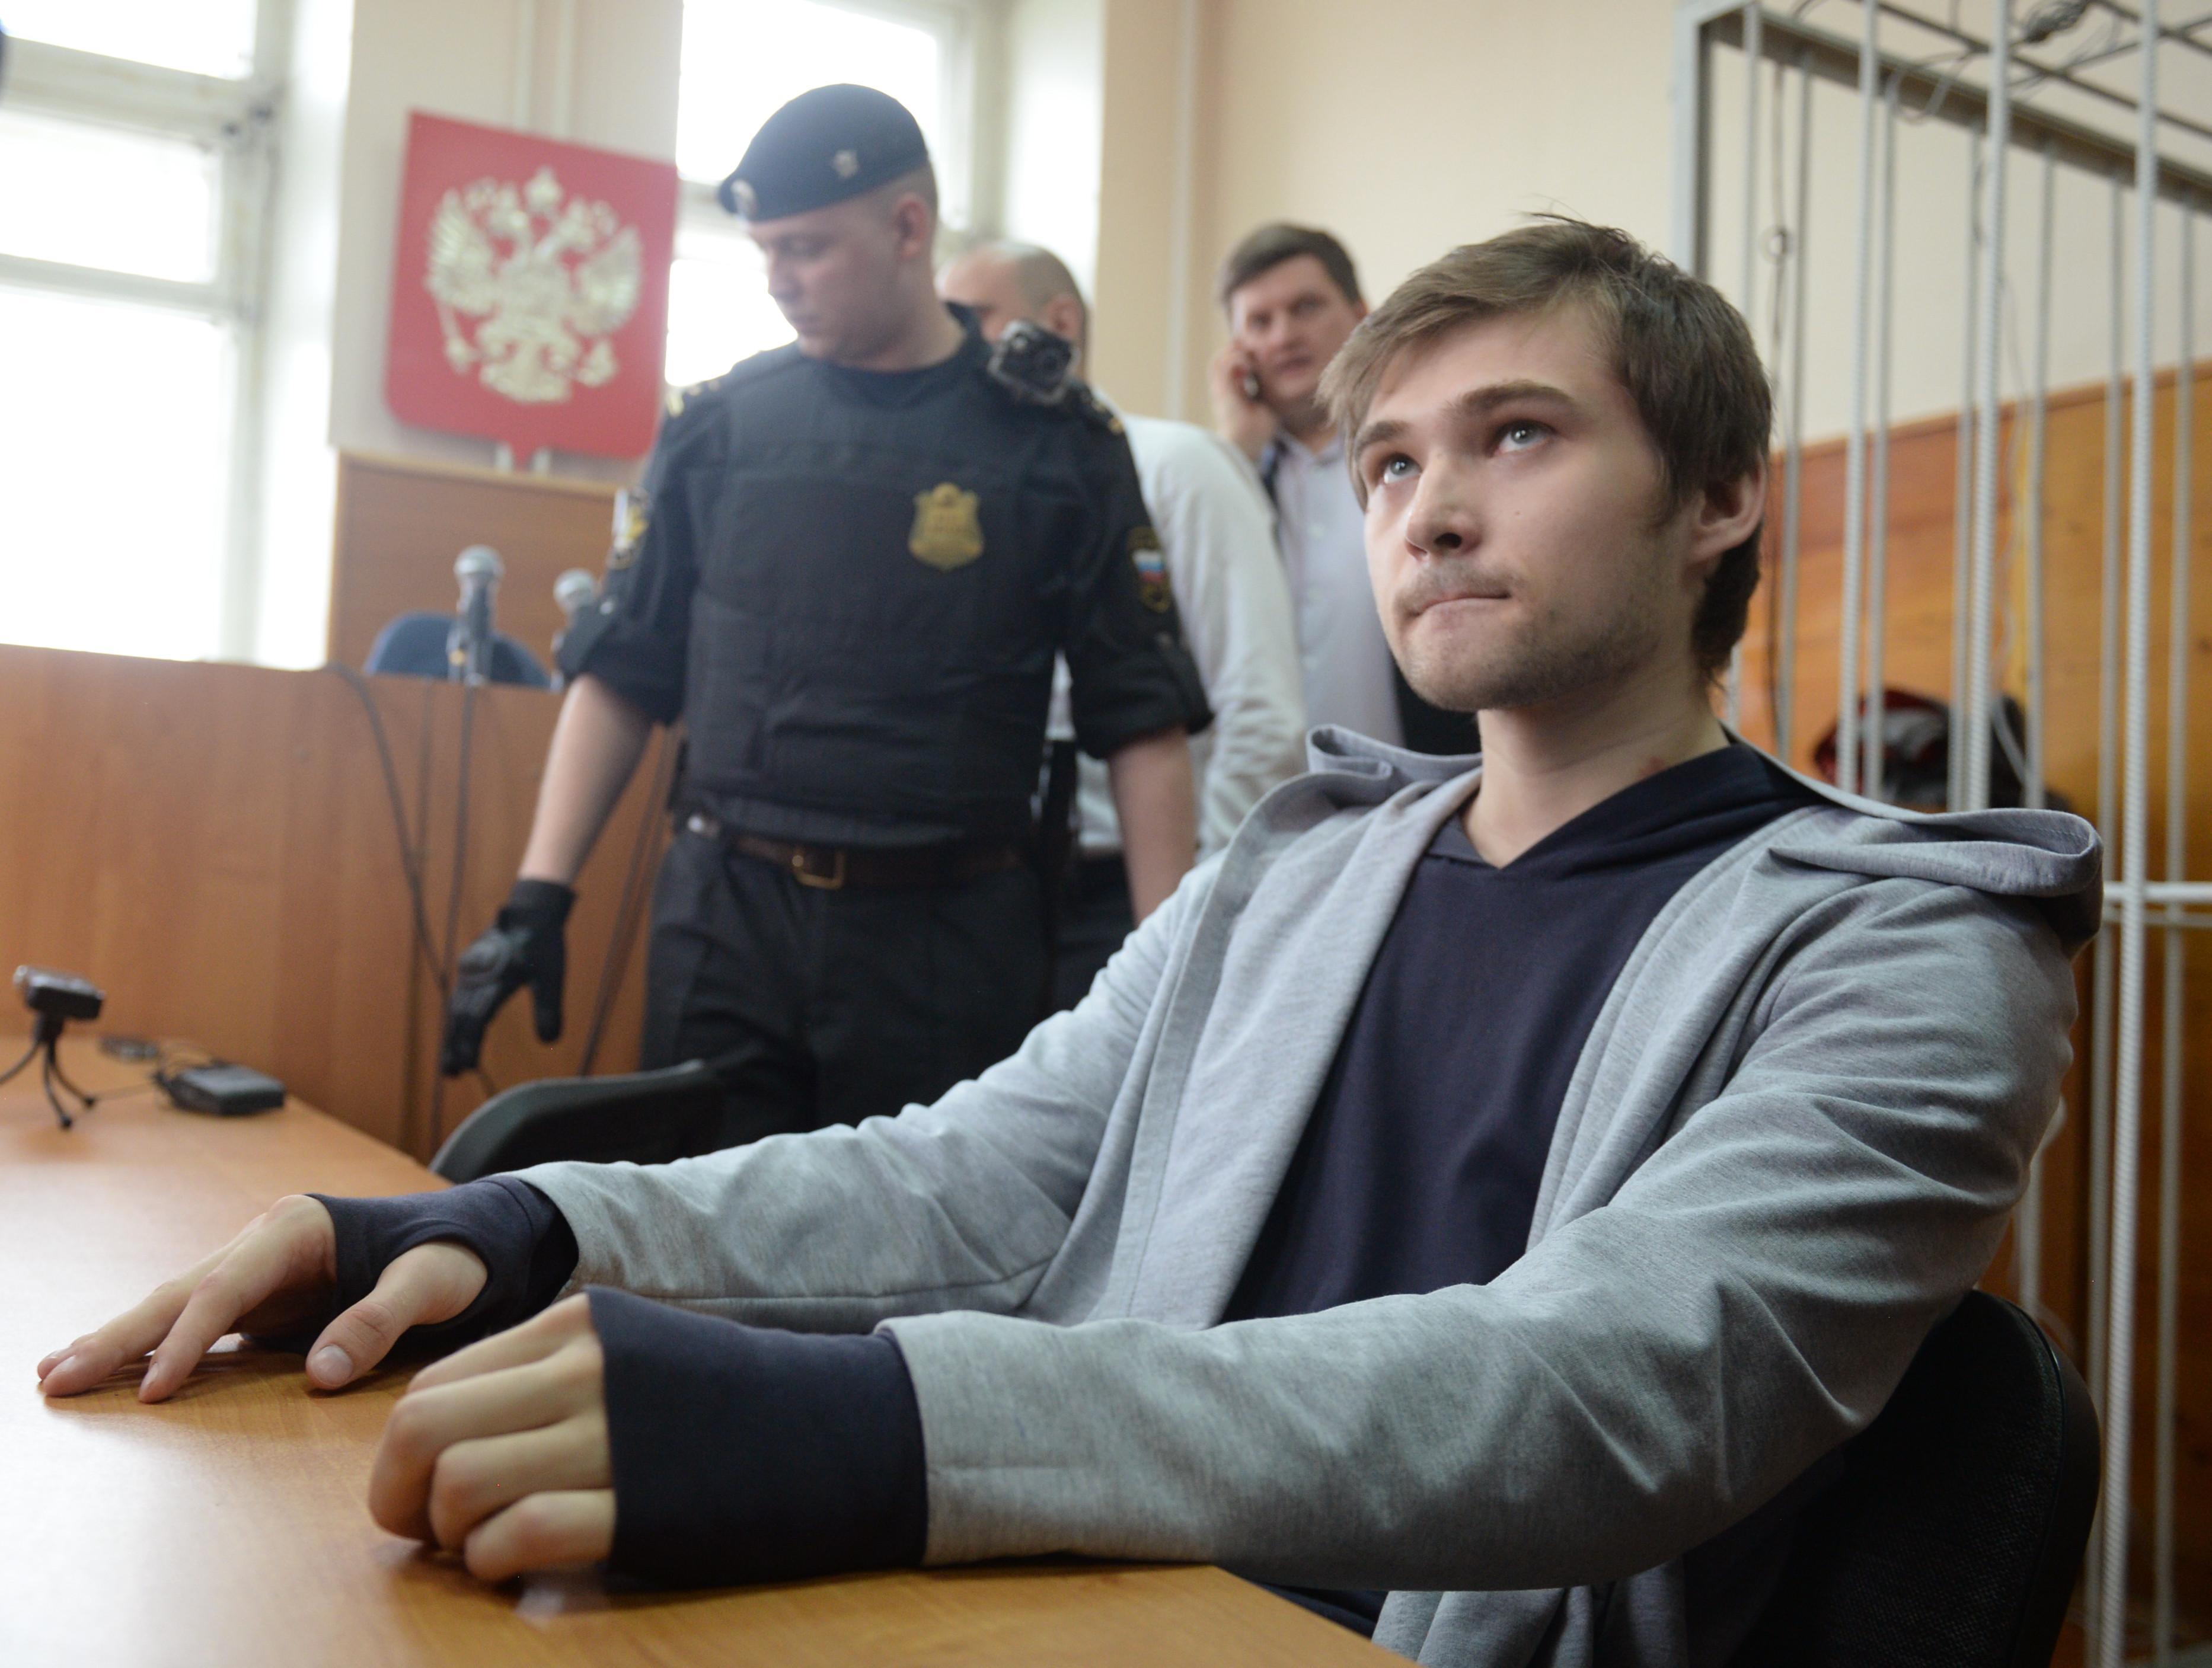 <p><span>Фото: &copy;РИА Новости/Павел Лисицын</span></p>